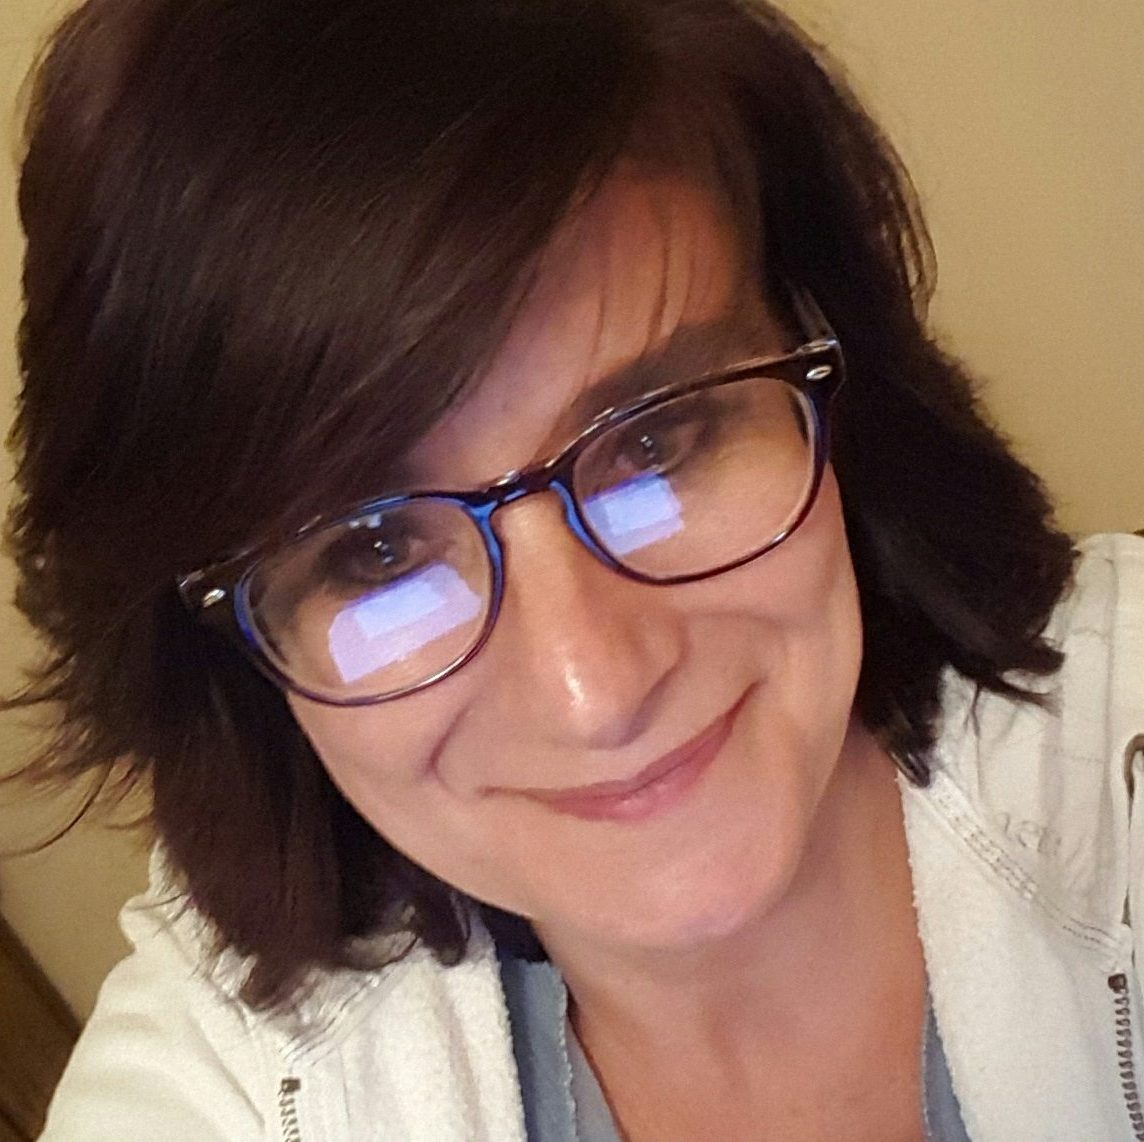 renee bryan with glasses